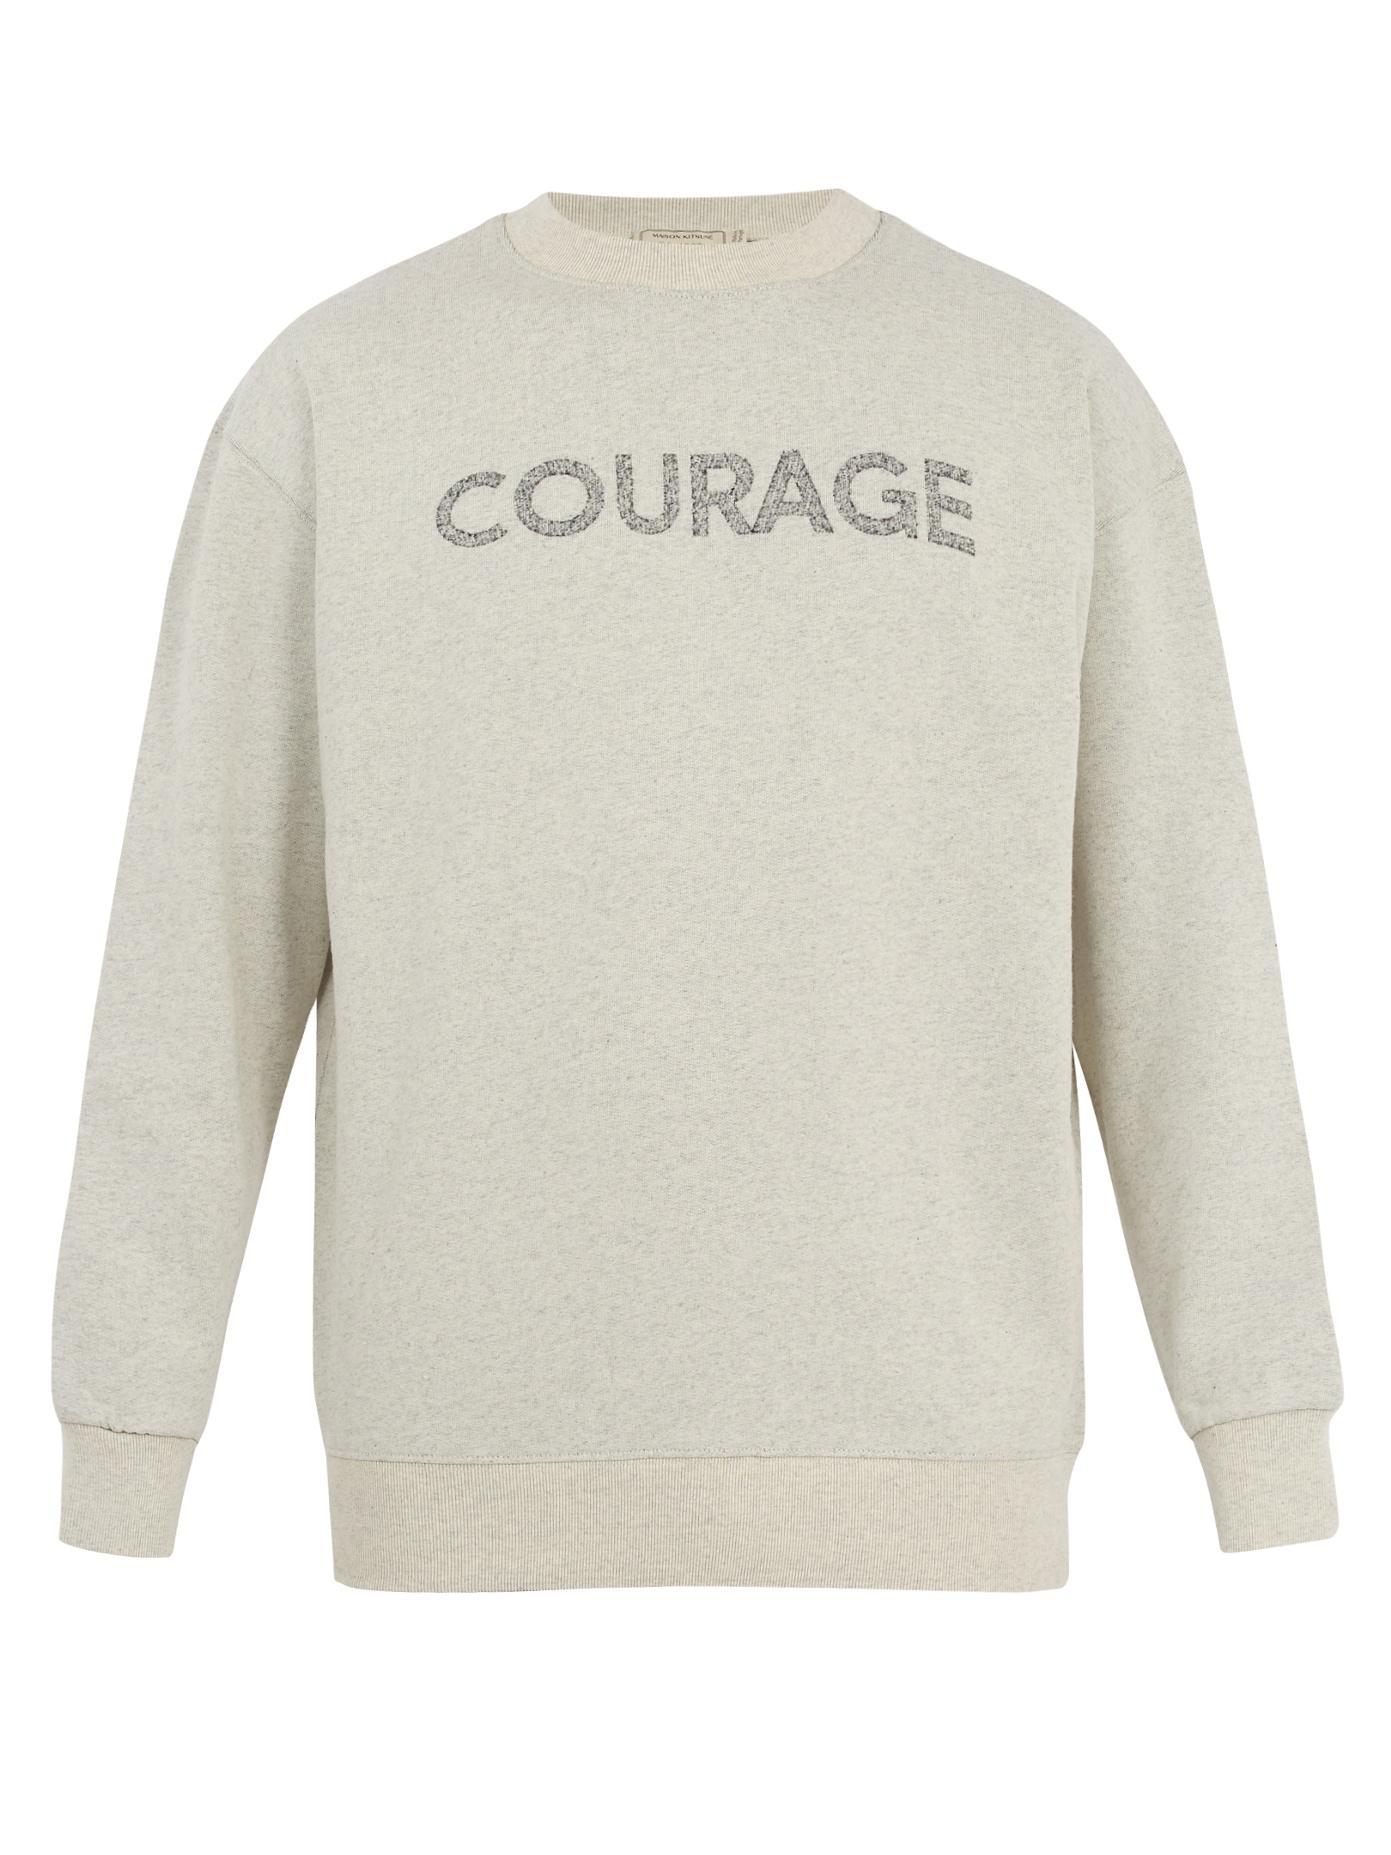 Maison KitsunÉ Courage-Print Cotton-Jersey Sweatshirt In Light Grey